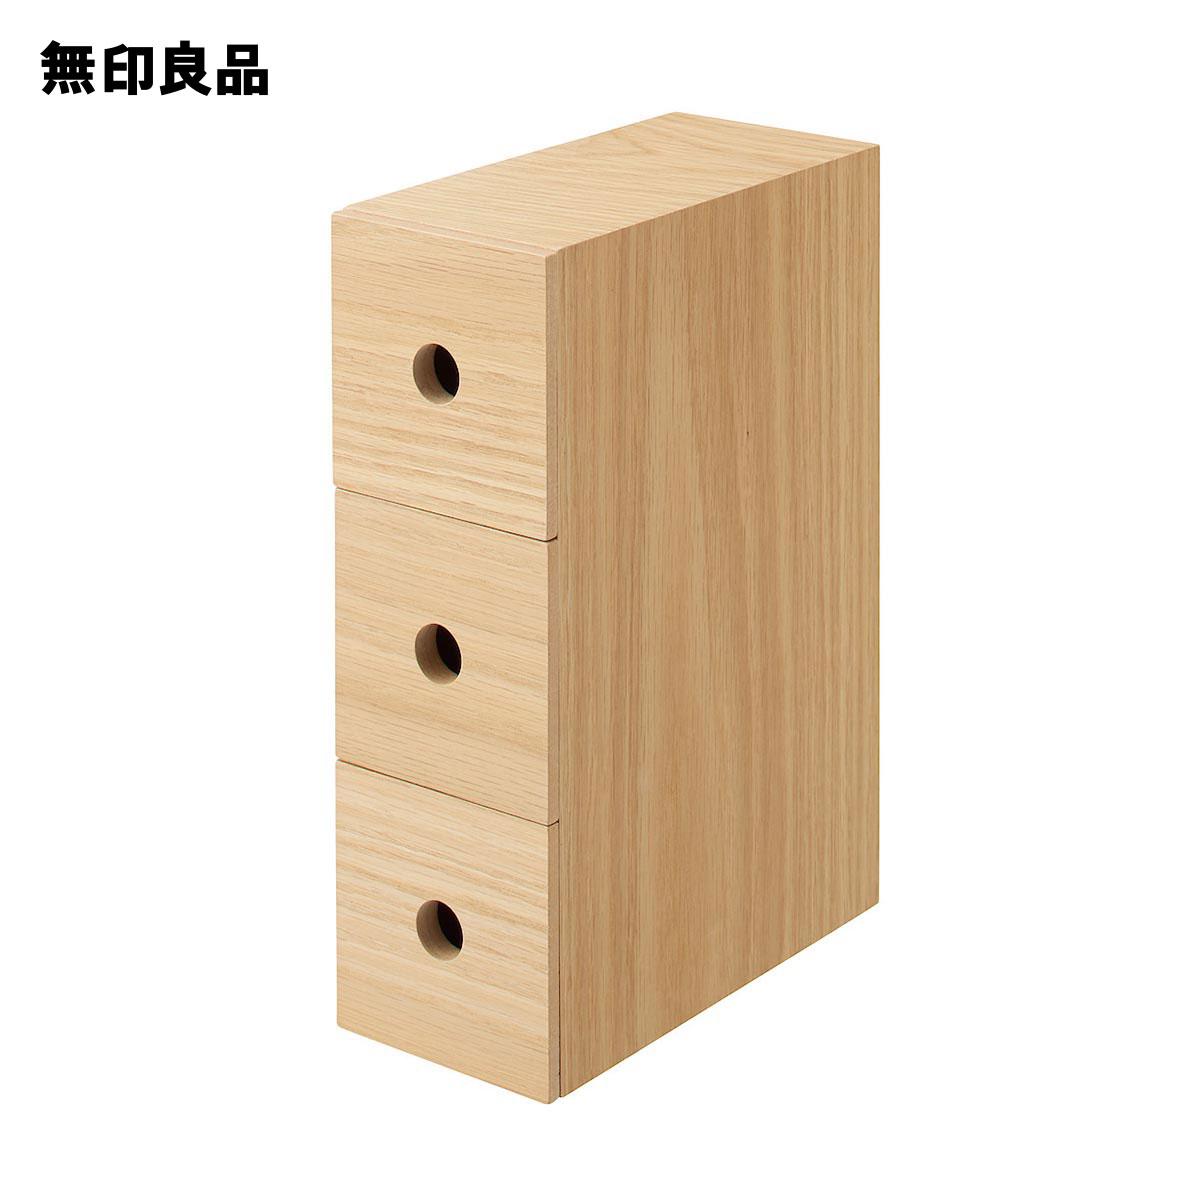 【無印良品 公式】 木製小物収納3段 約幅8.4x奥行17×高さ25.2cm